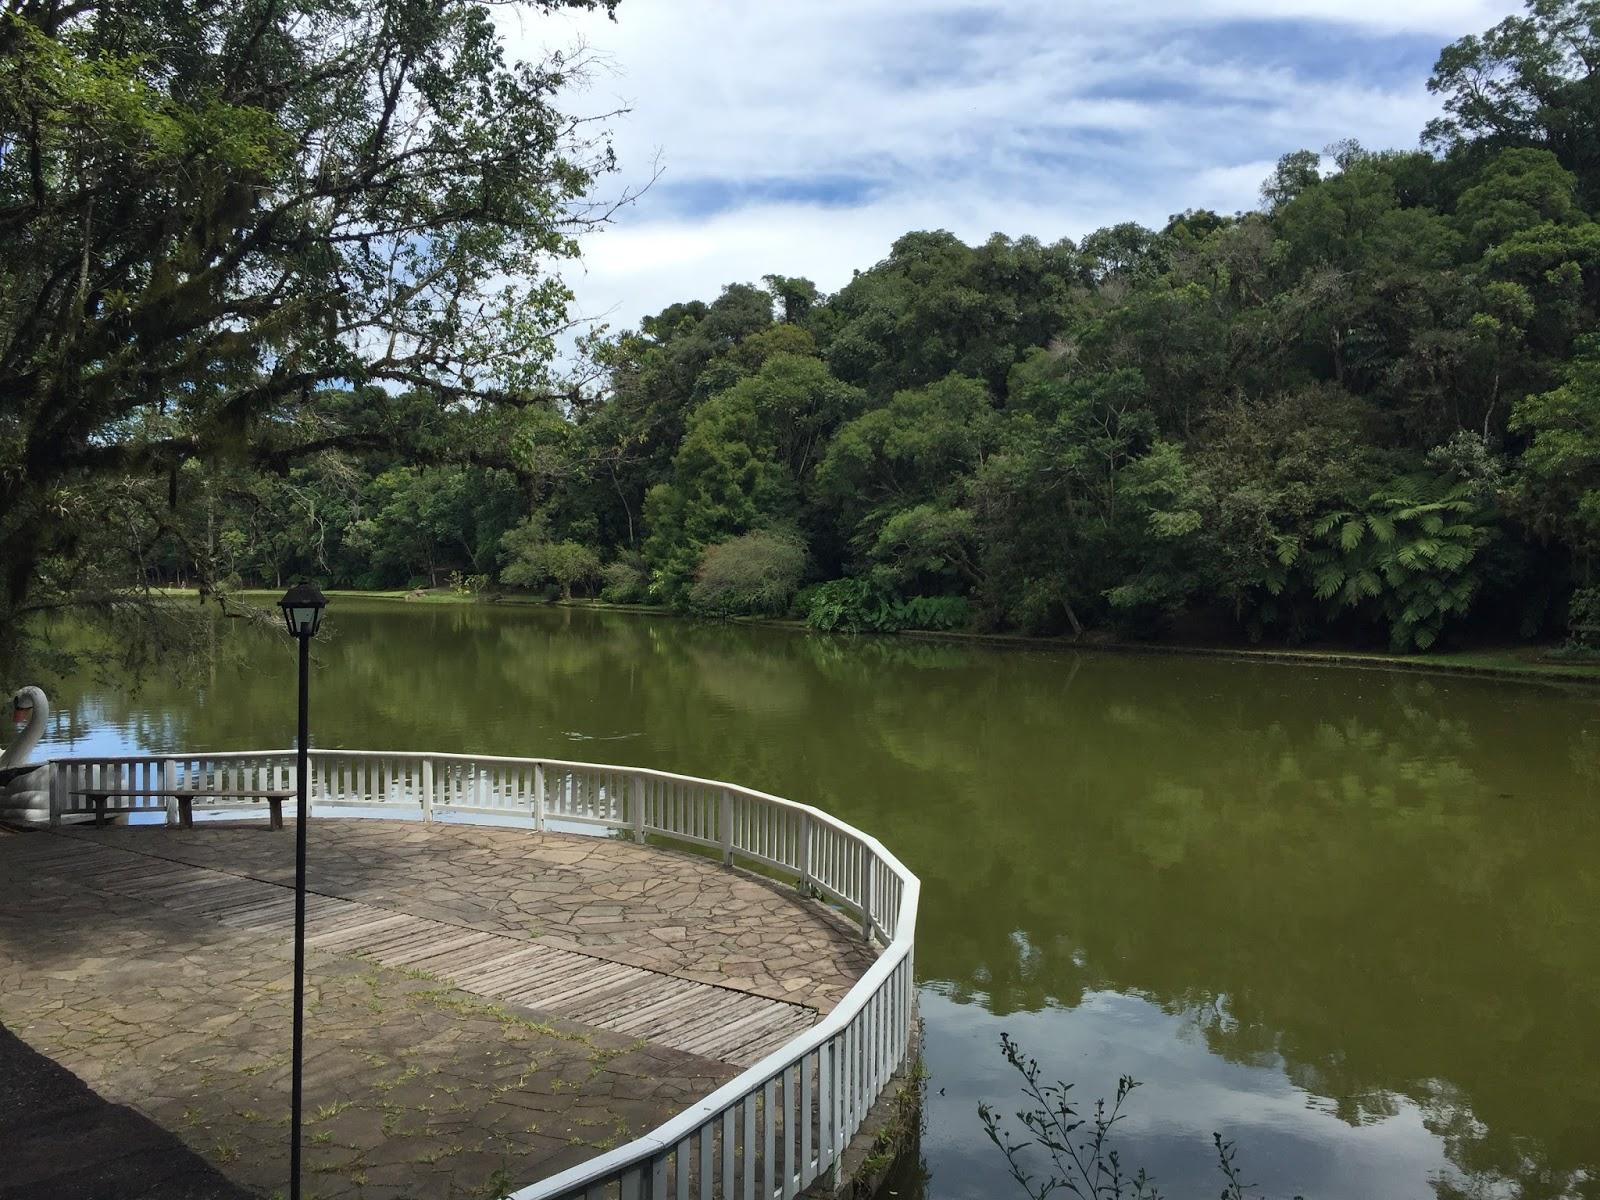 lago na aldeia do imigrante